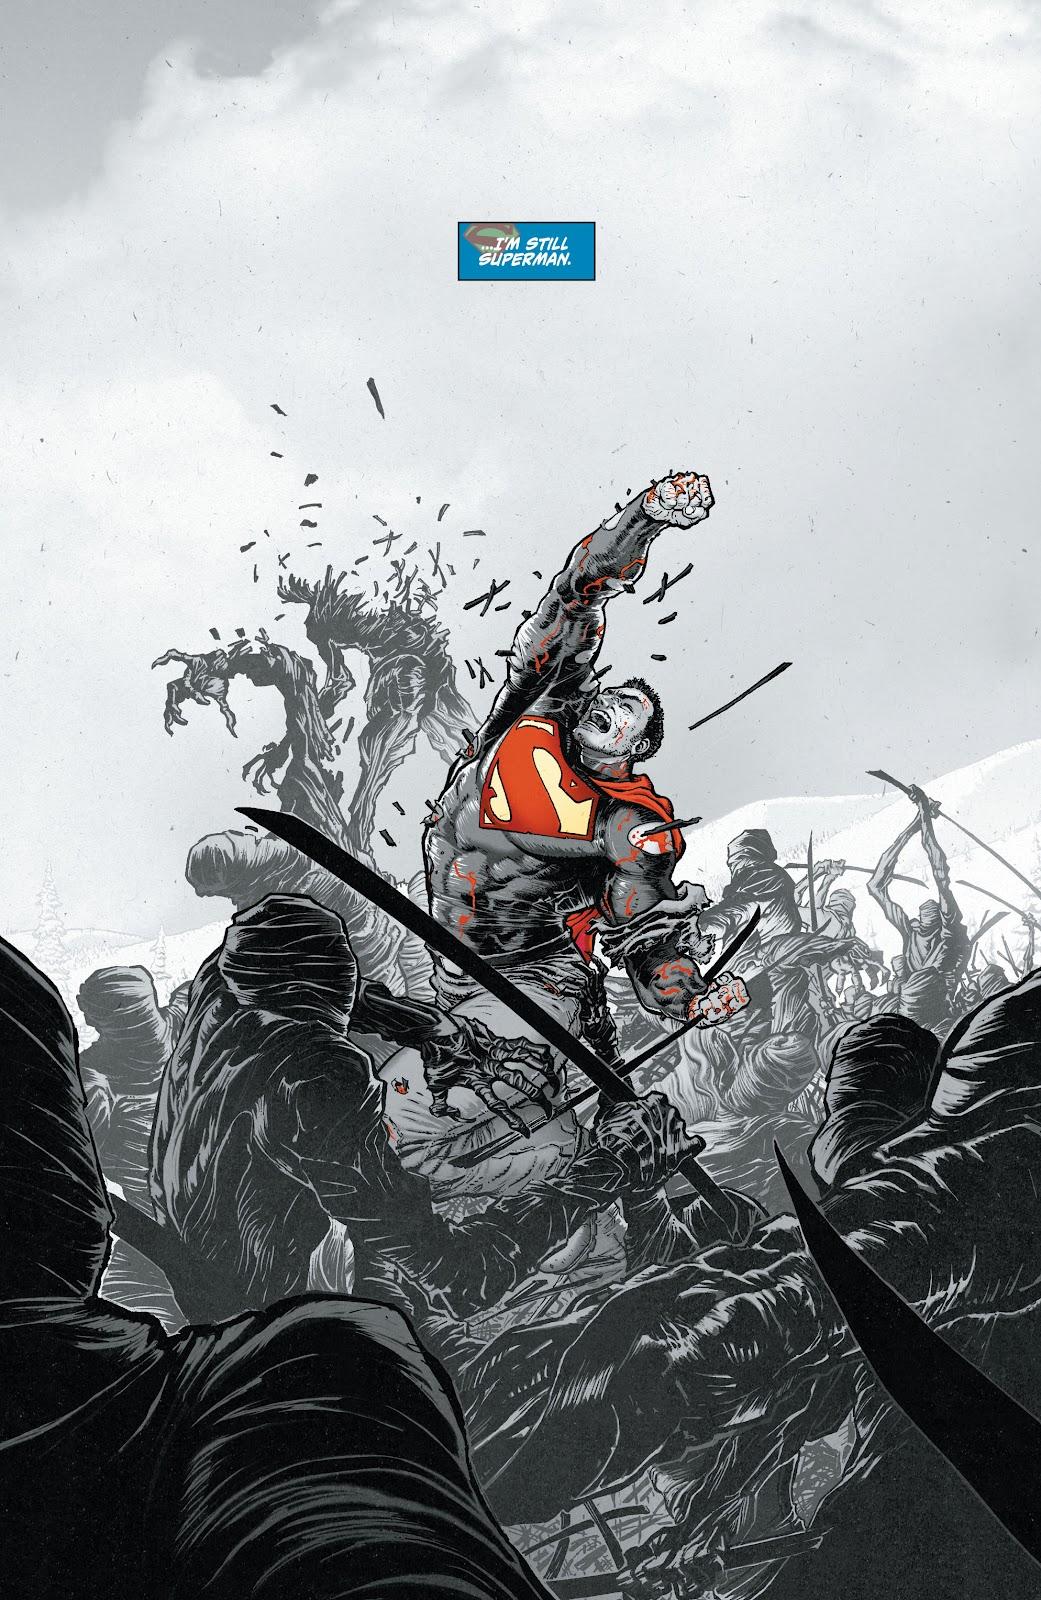 Read online DC Sneak Peek: Action Comics comic -  Issue # Full - 5